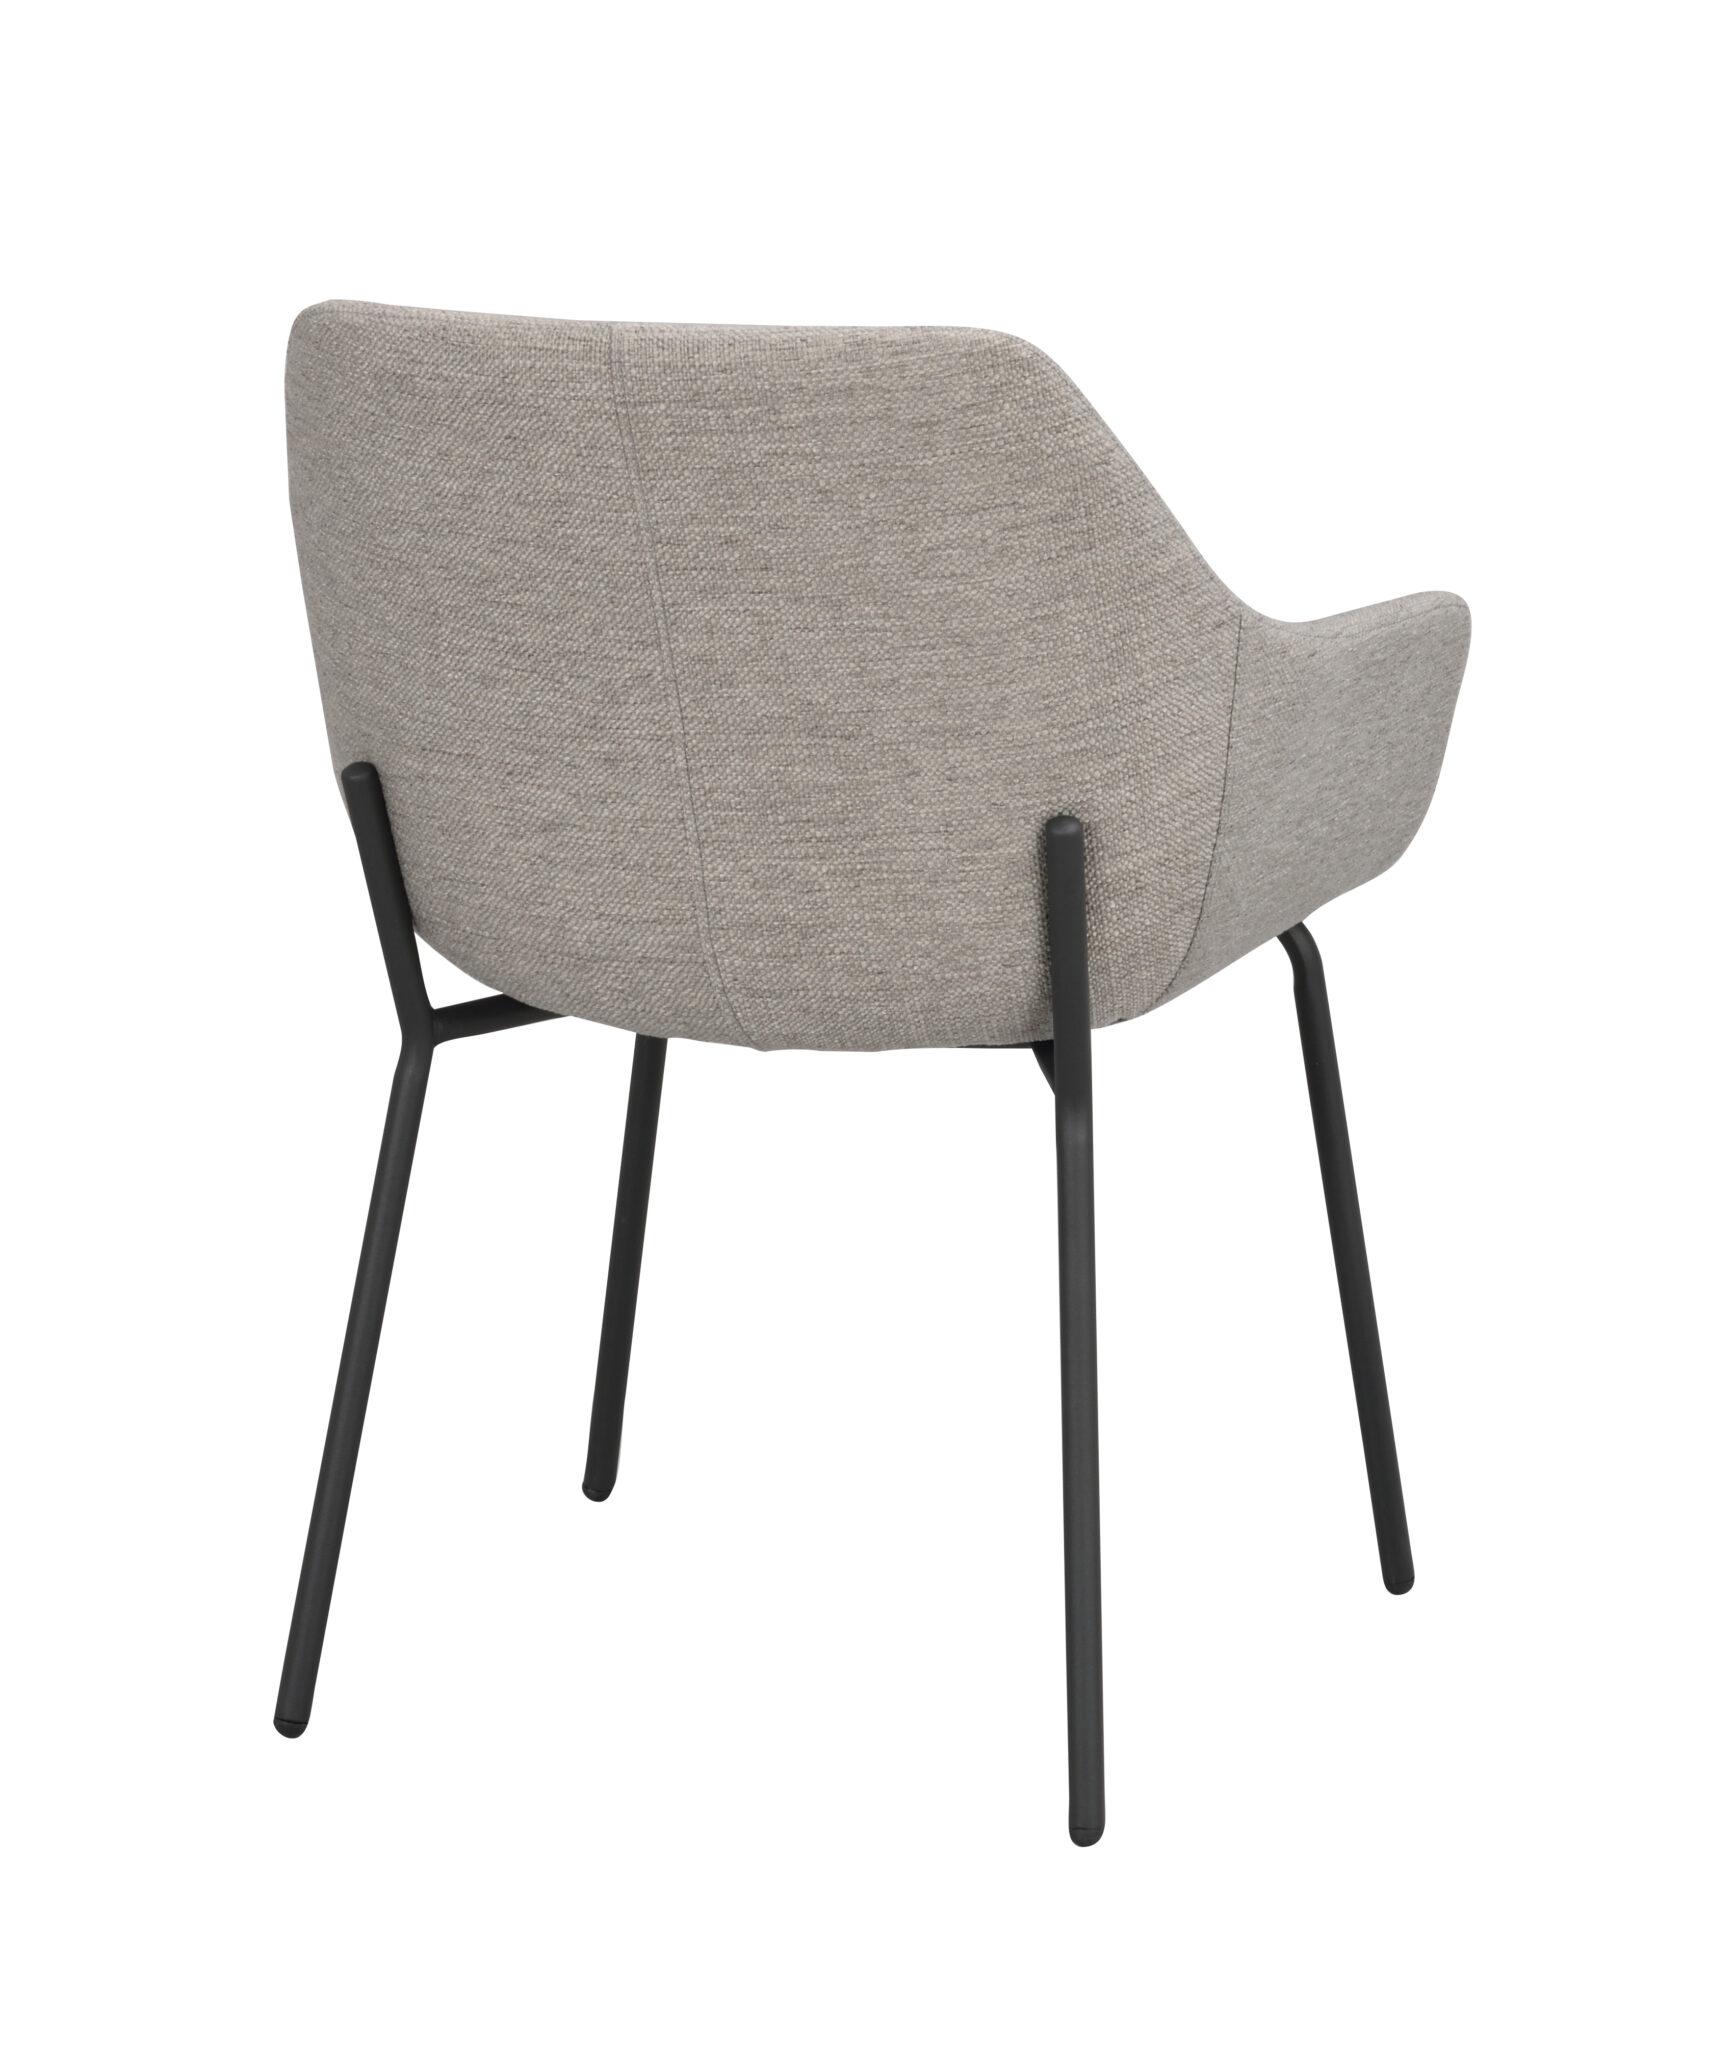 Haley arm chair Light grey_black 110480 3